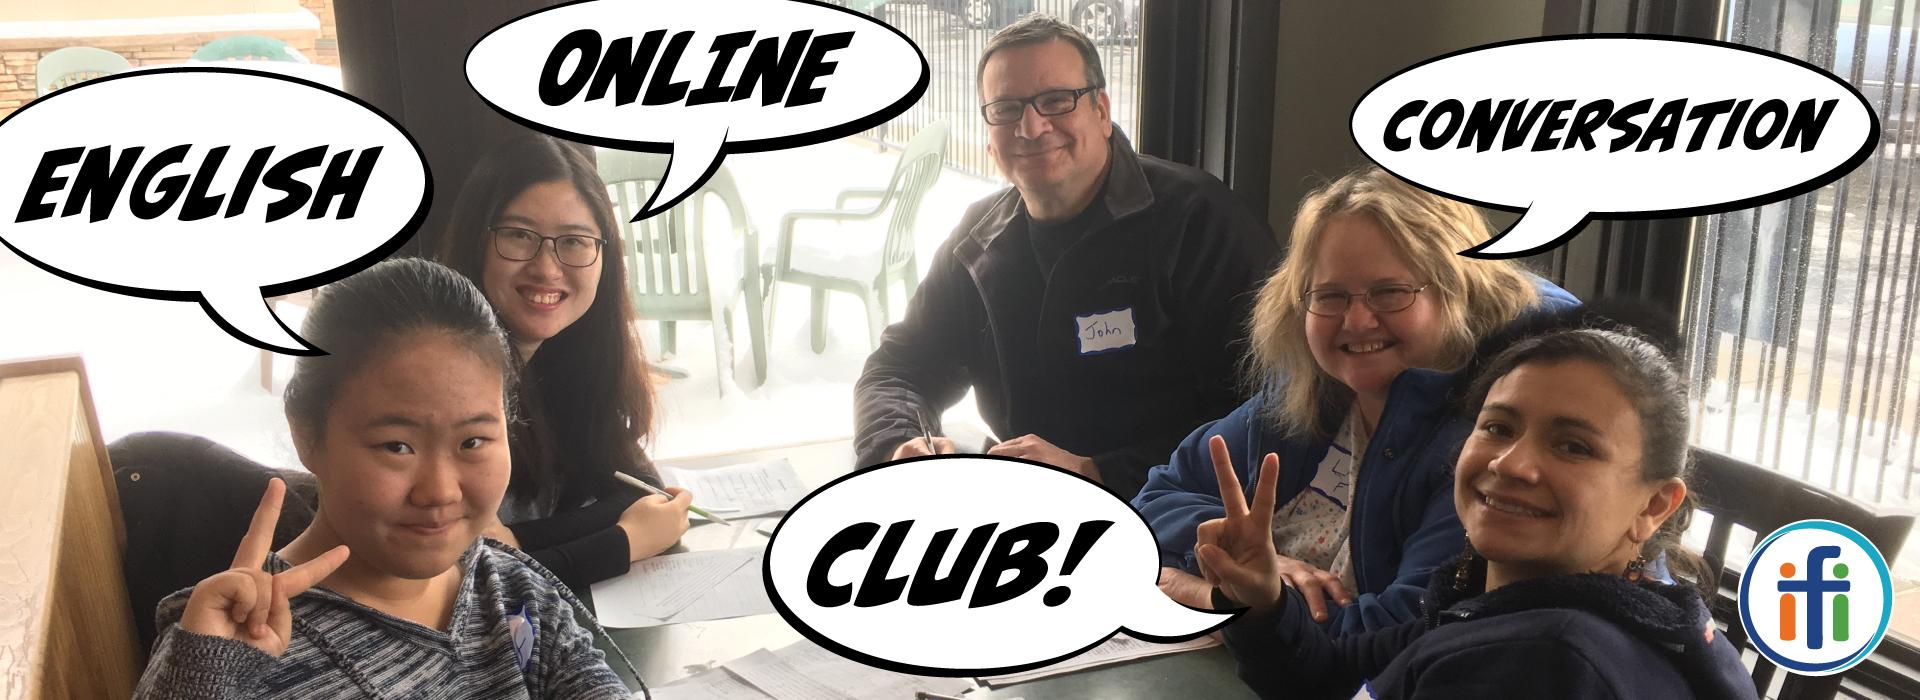 ONLINE English Conversation Club